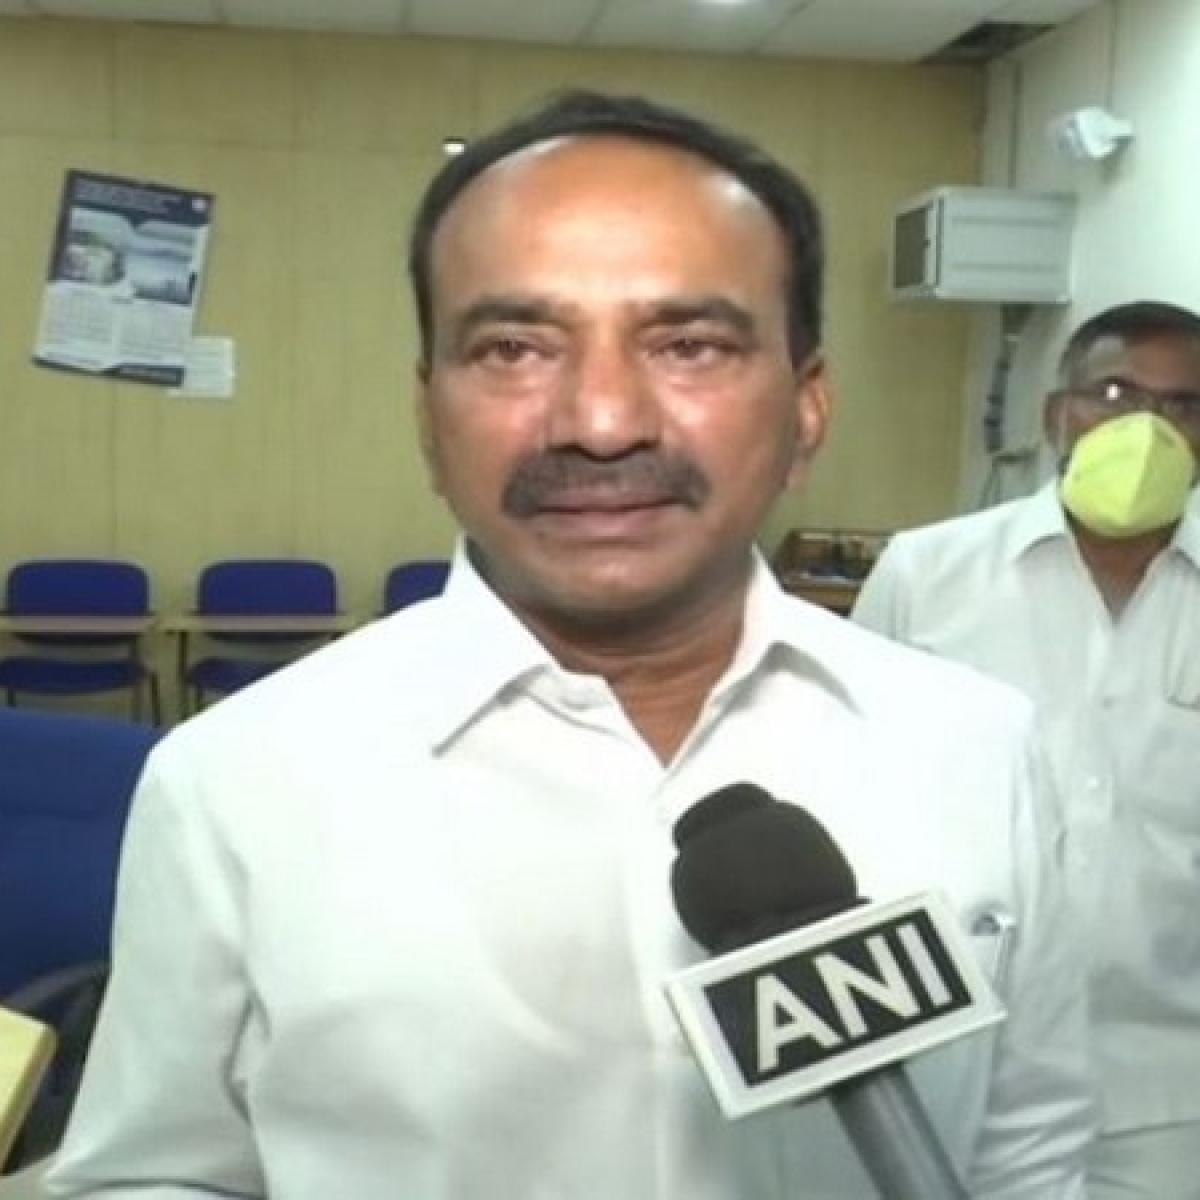 Coronavirus update: Telangana State Health Minister Eatala Rajendra condemns attack on health workers